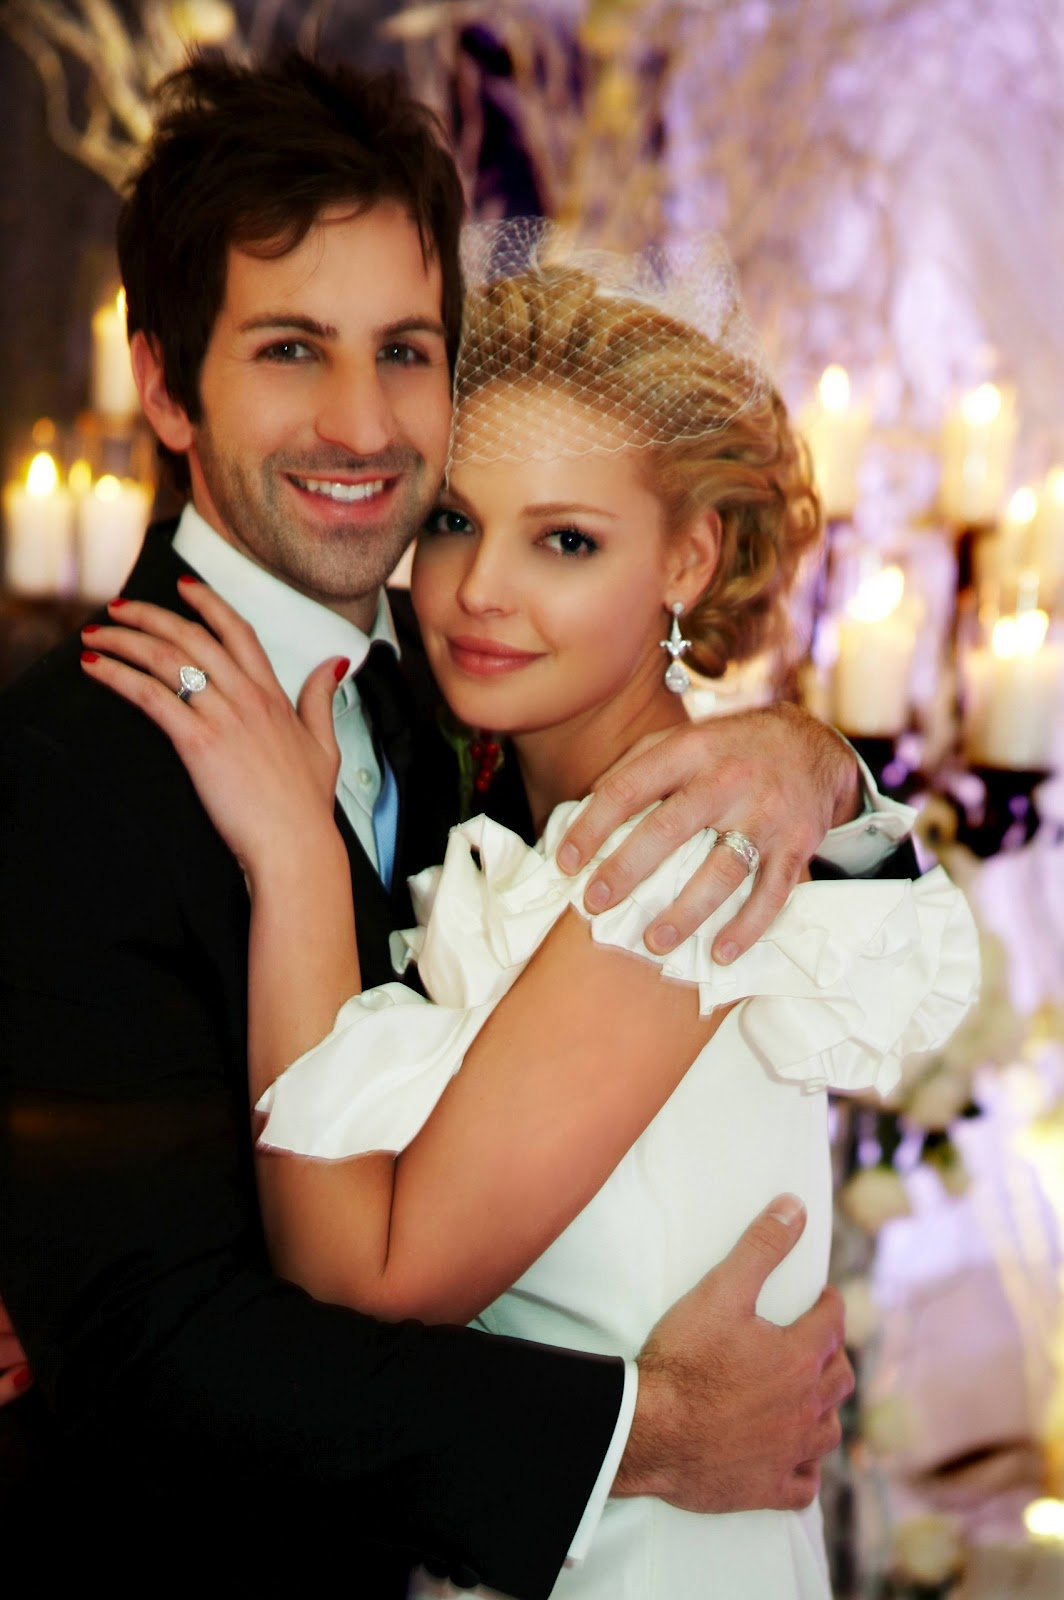 Best 25+ Wedding Hairstyles ideas on Pinterest | Prom ...